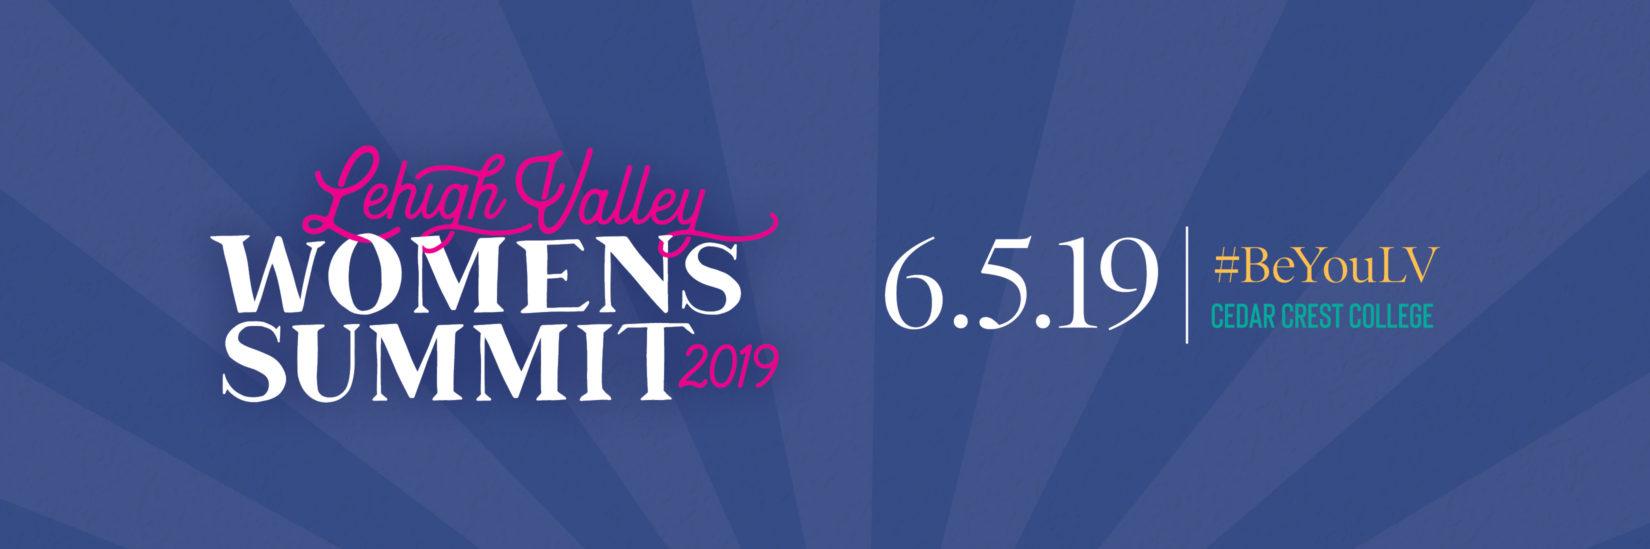 Lehigh Valley Women's Summit 2019 – Just another WordPress site